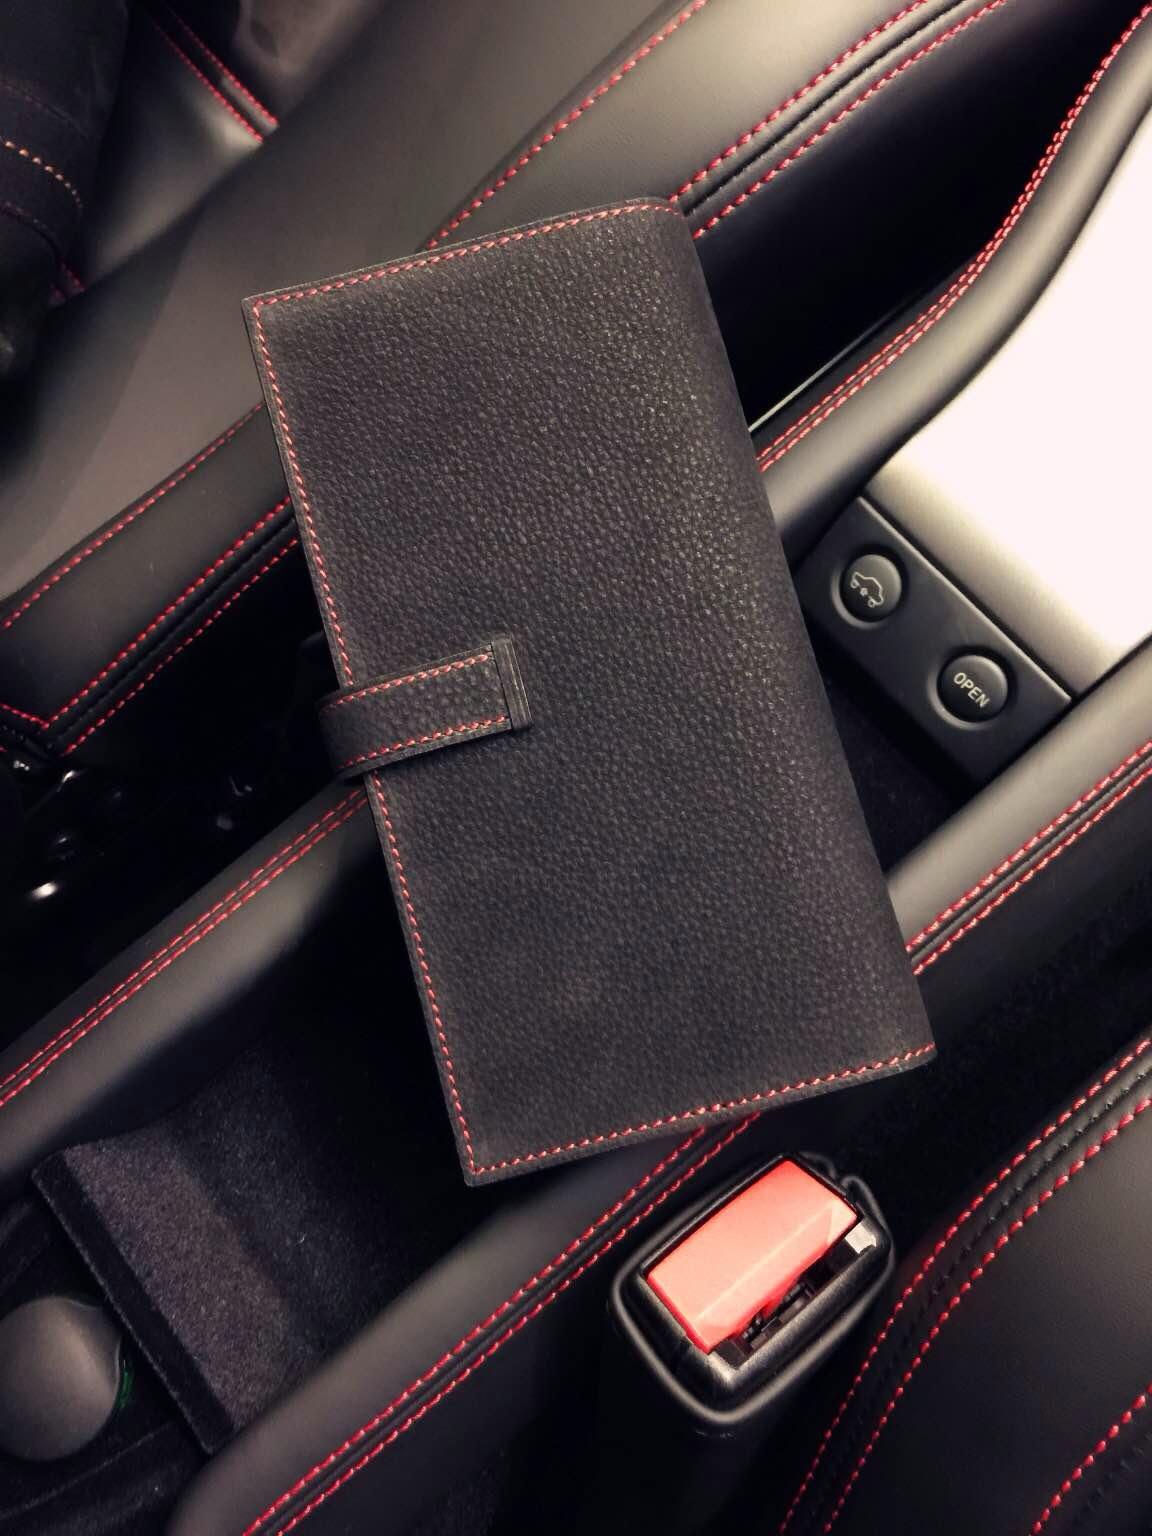 Wholesale Hermes CK89 Black Suede Leather Long Bean Wallet Clutch Bag